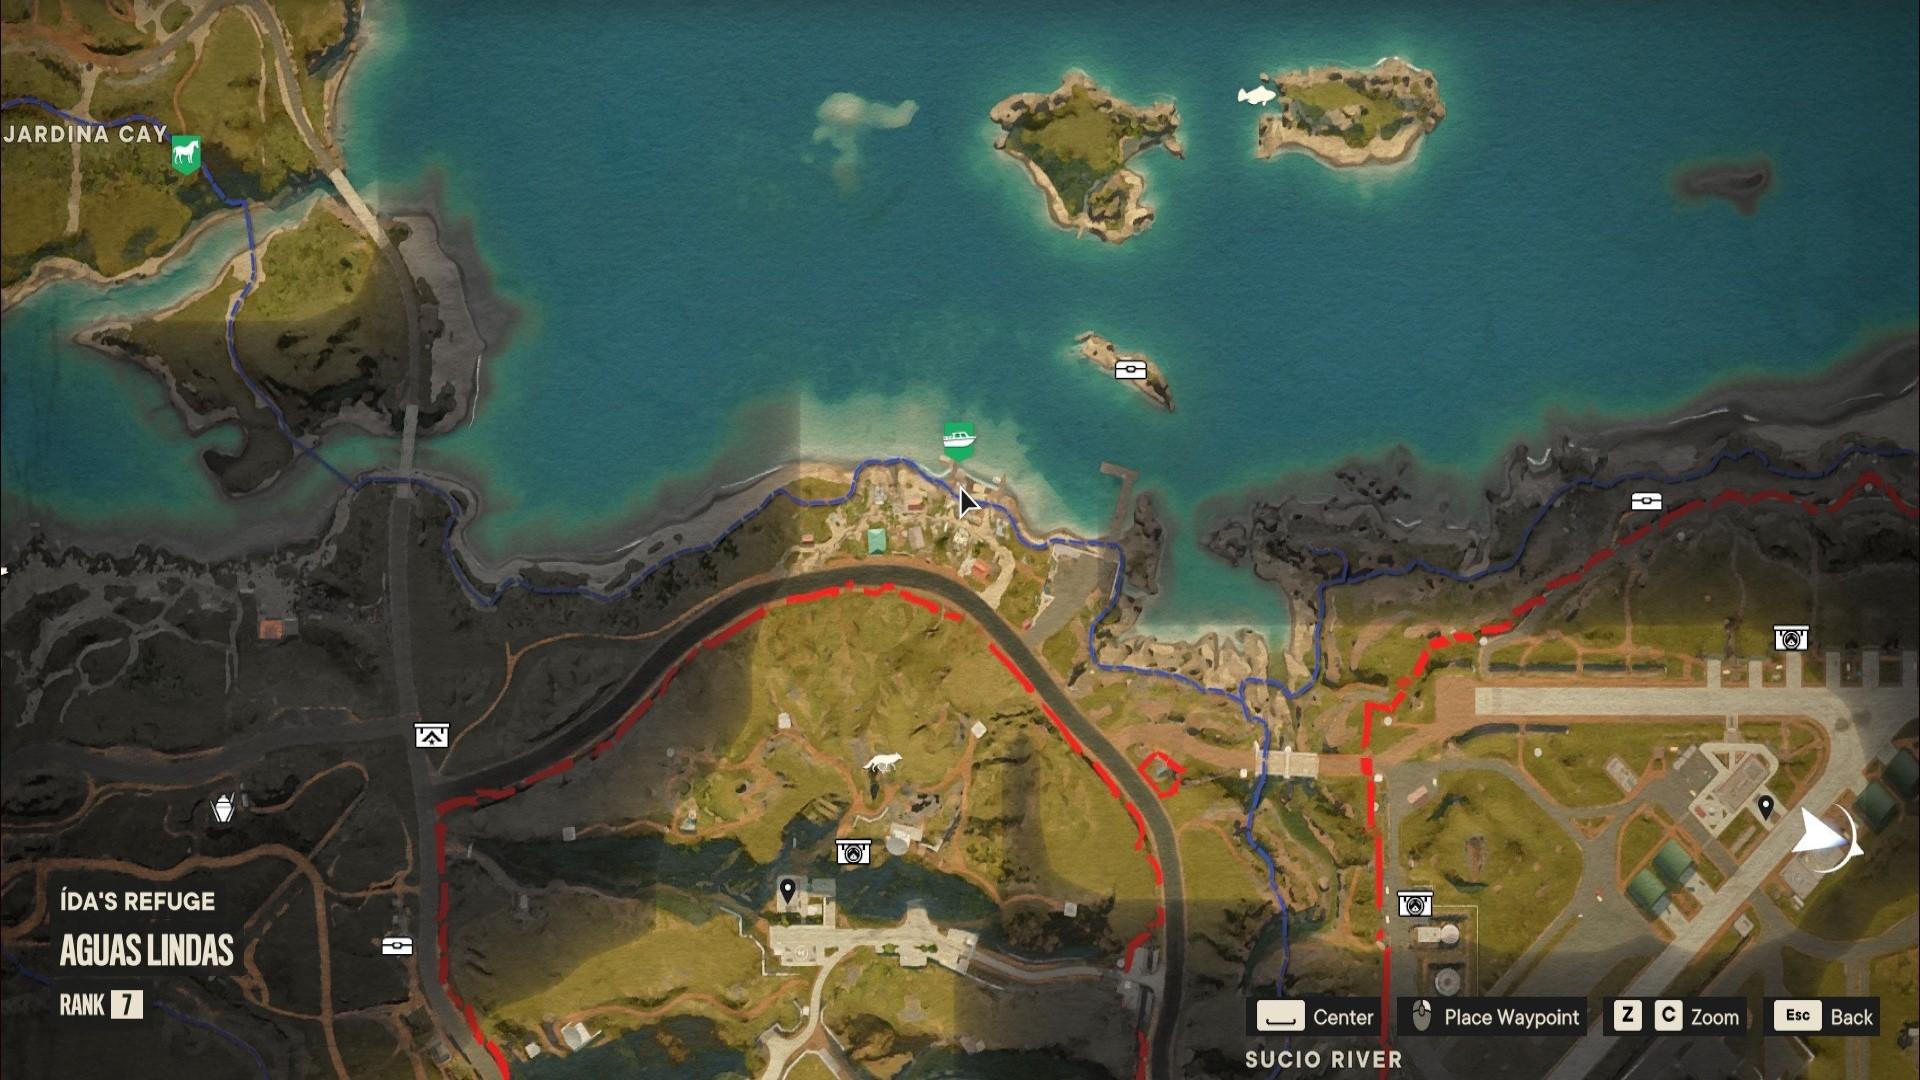 A Far Cry 6 Criptograma chest location on the north coast of Madrugada